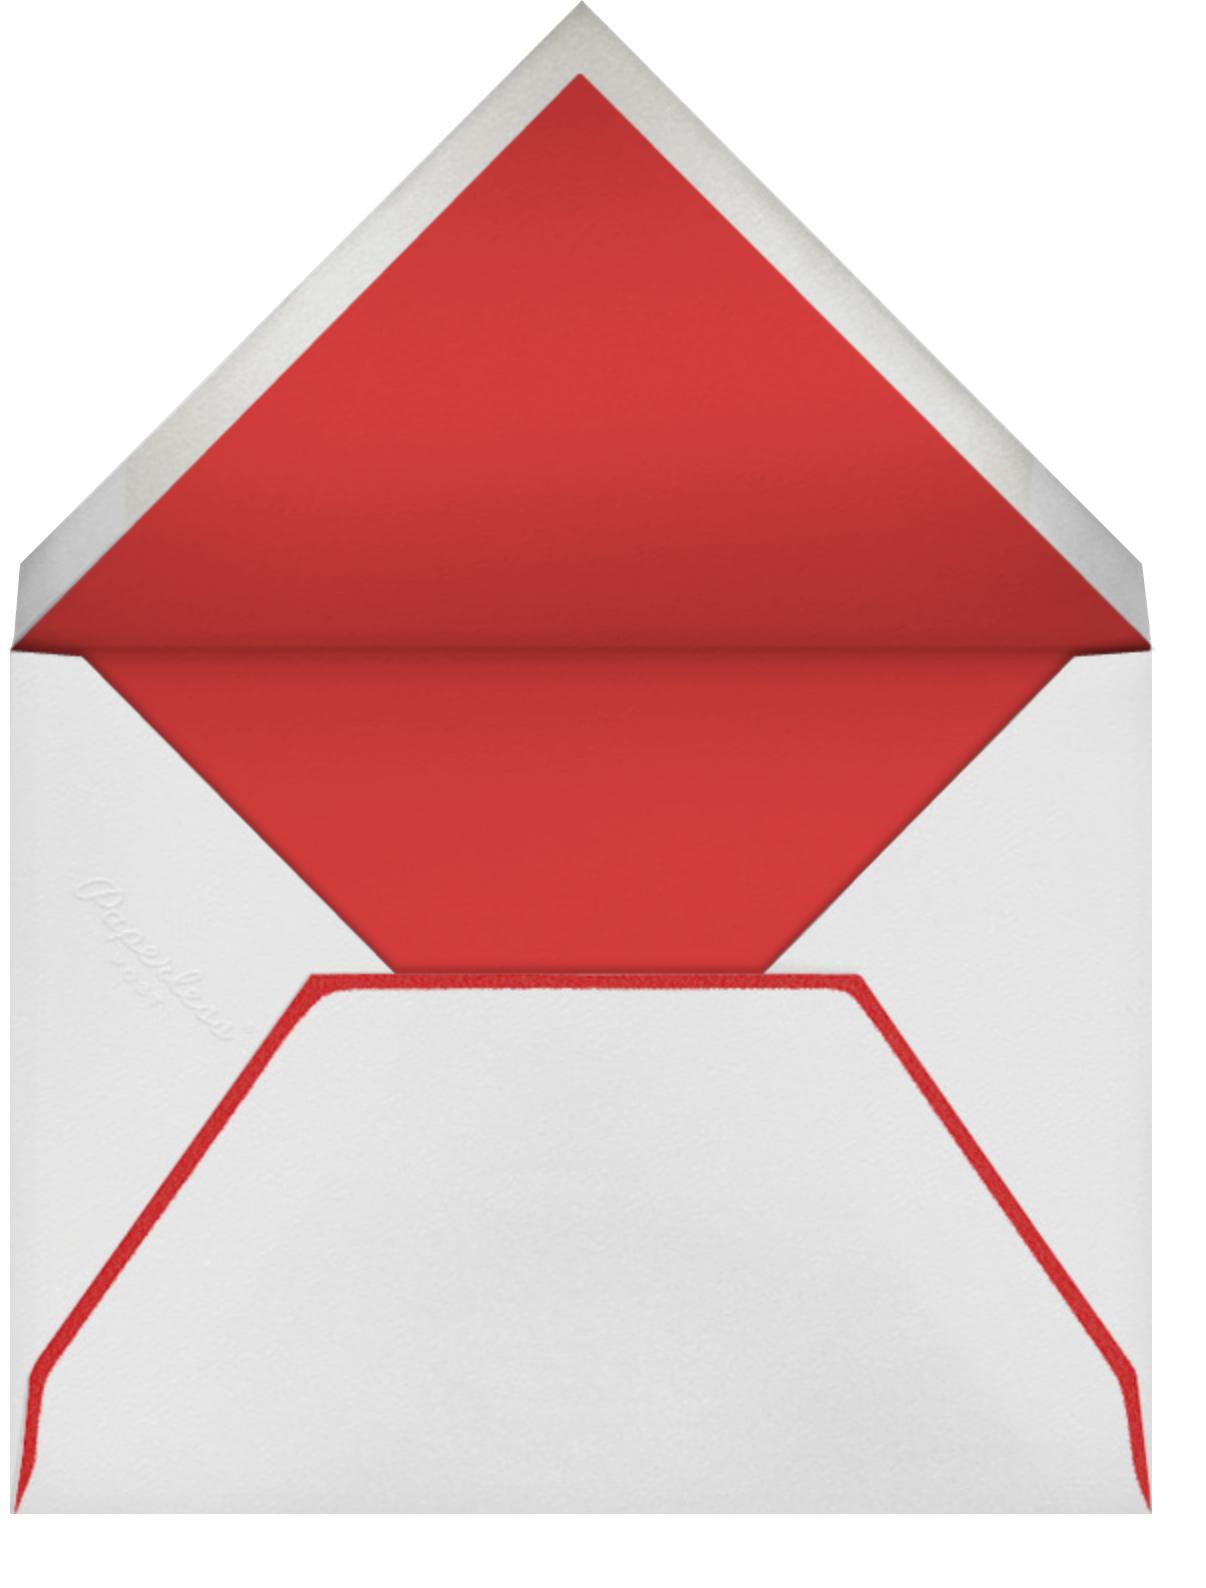 Mom and Me (Blanca Gomez) - Deep - Red Cap Cards - Envelope